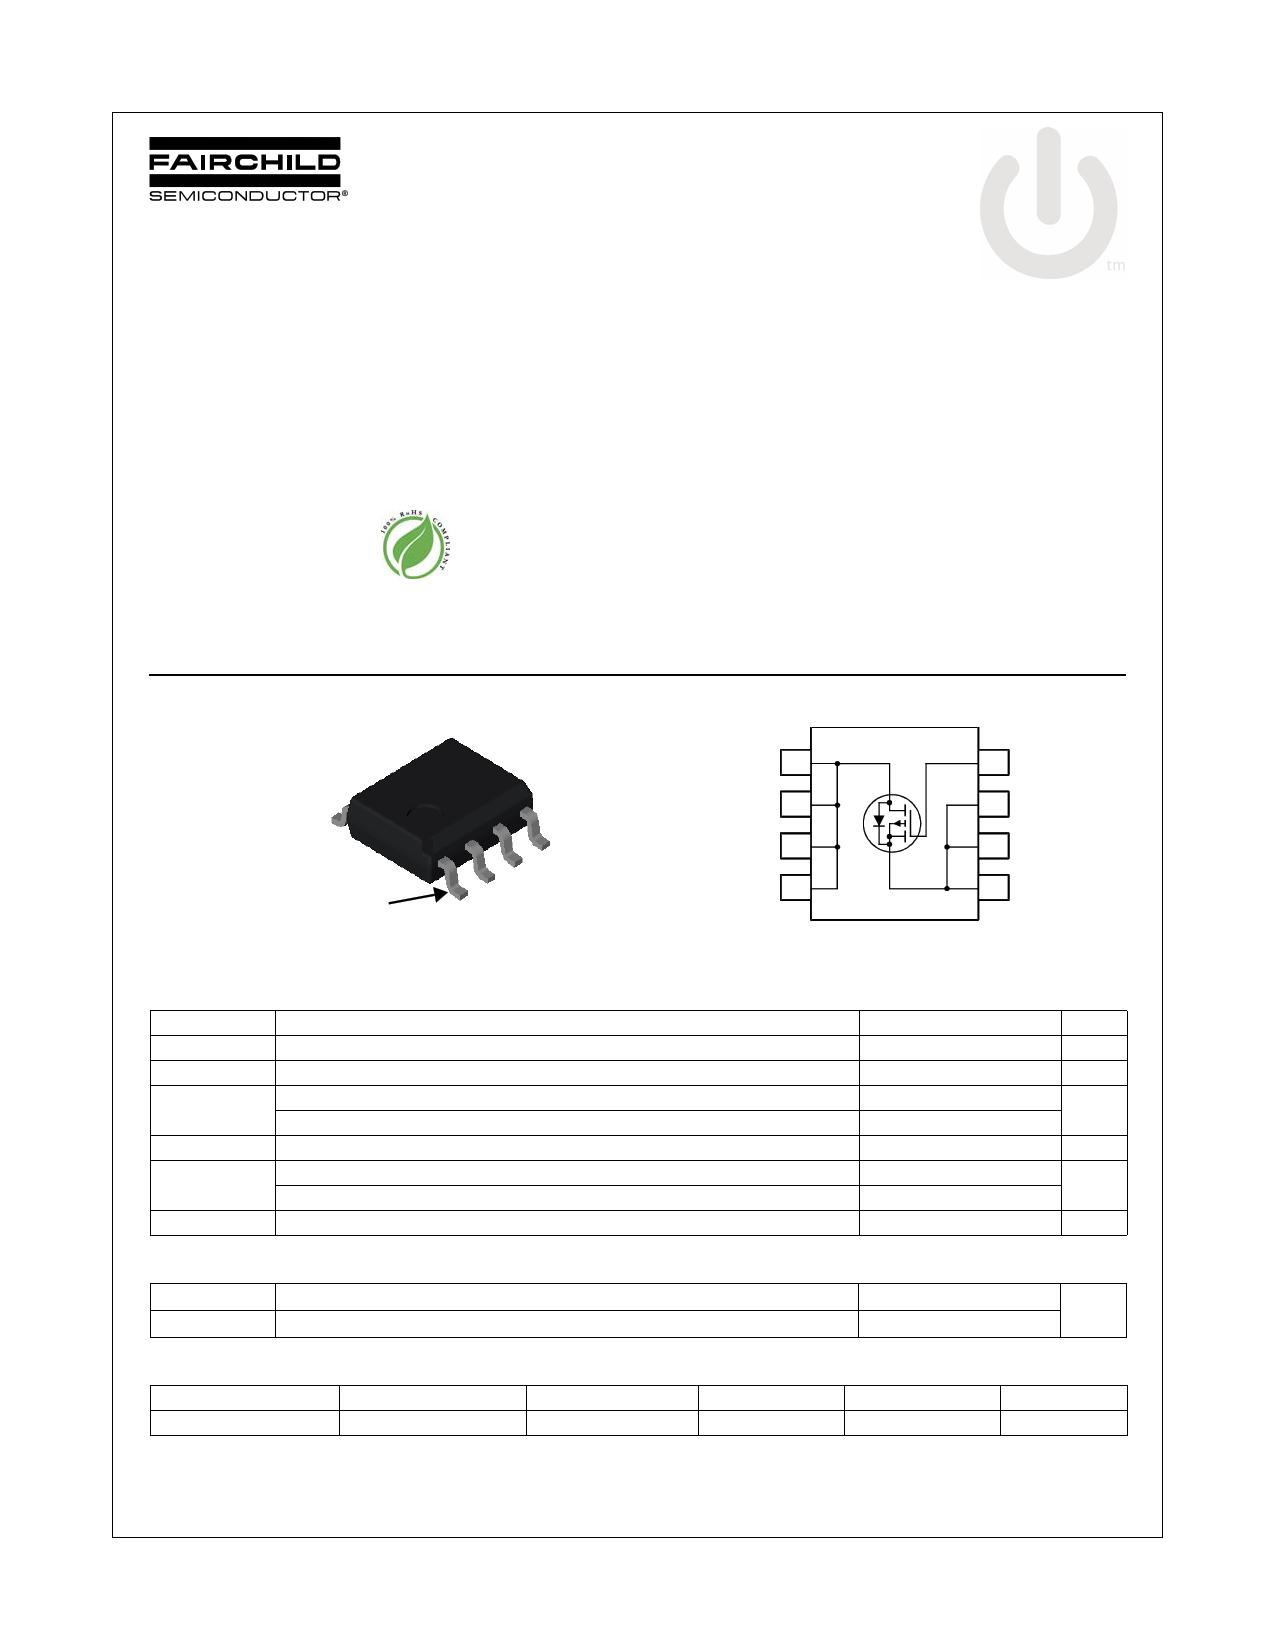 FDS4141 데이터시트 및 FDS4141 PDF